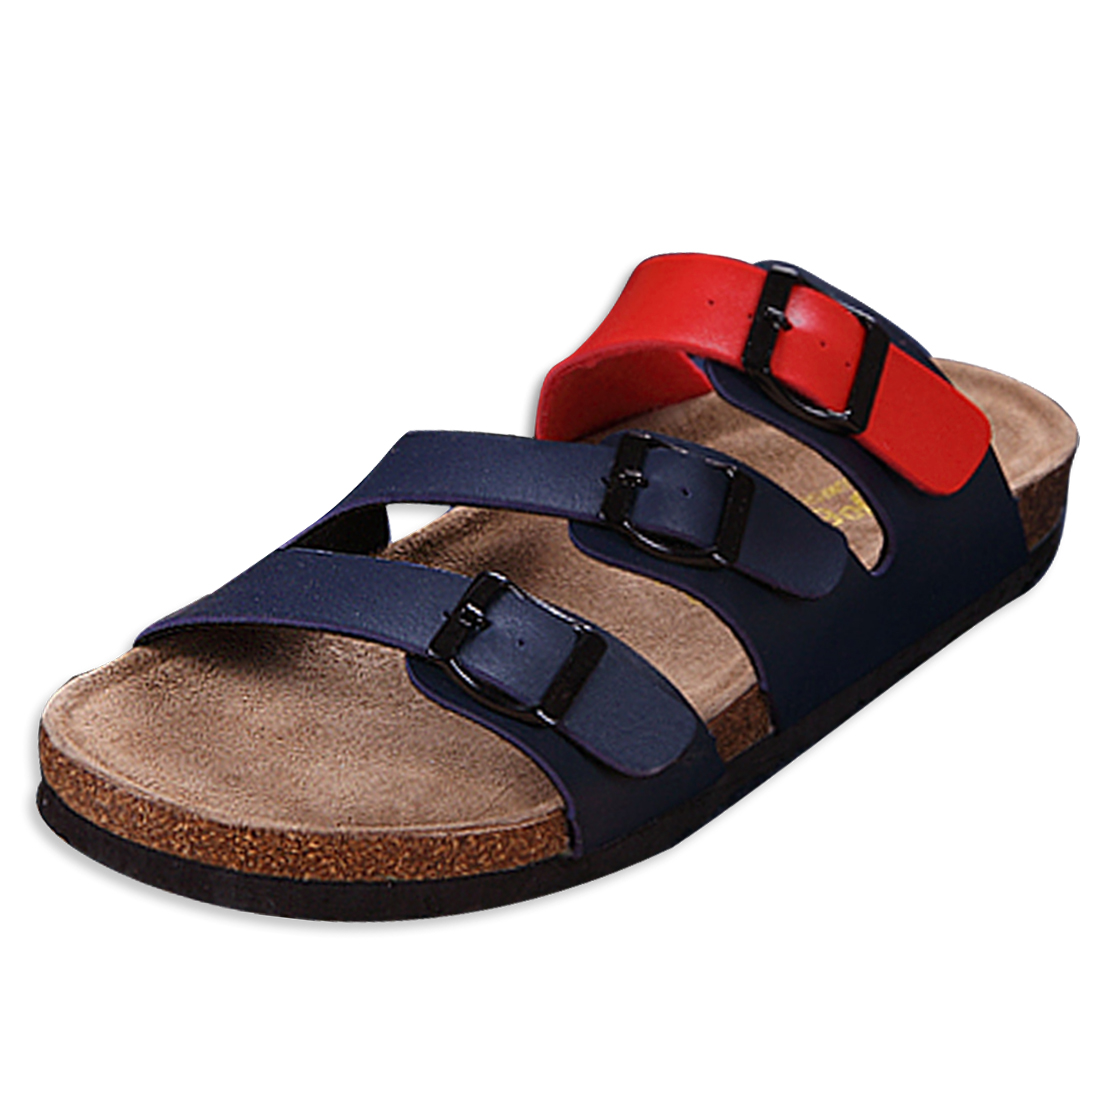 Men Outdoor Wear Slip-on Buckles Red Navy Blue Sandals US 10